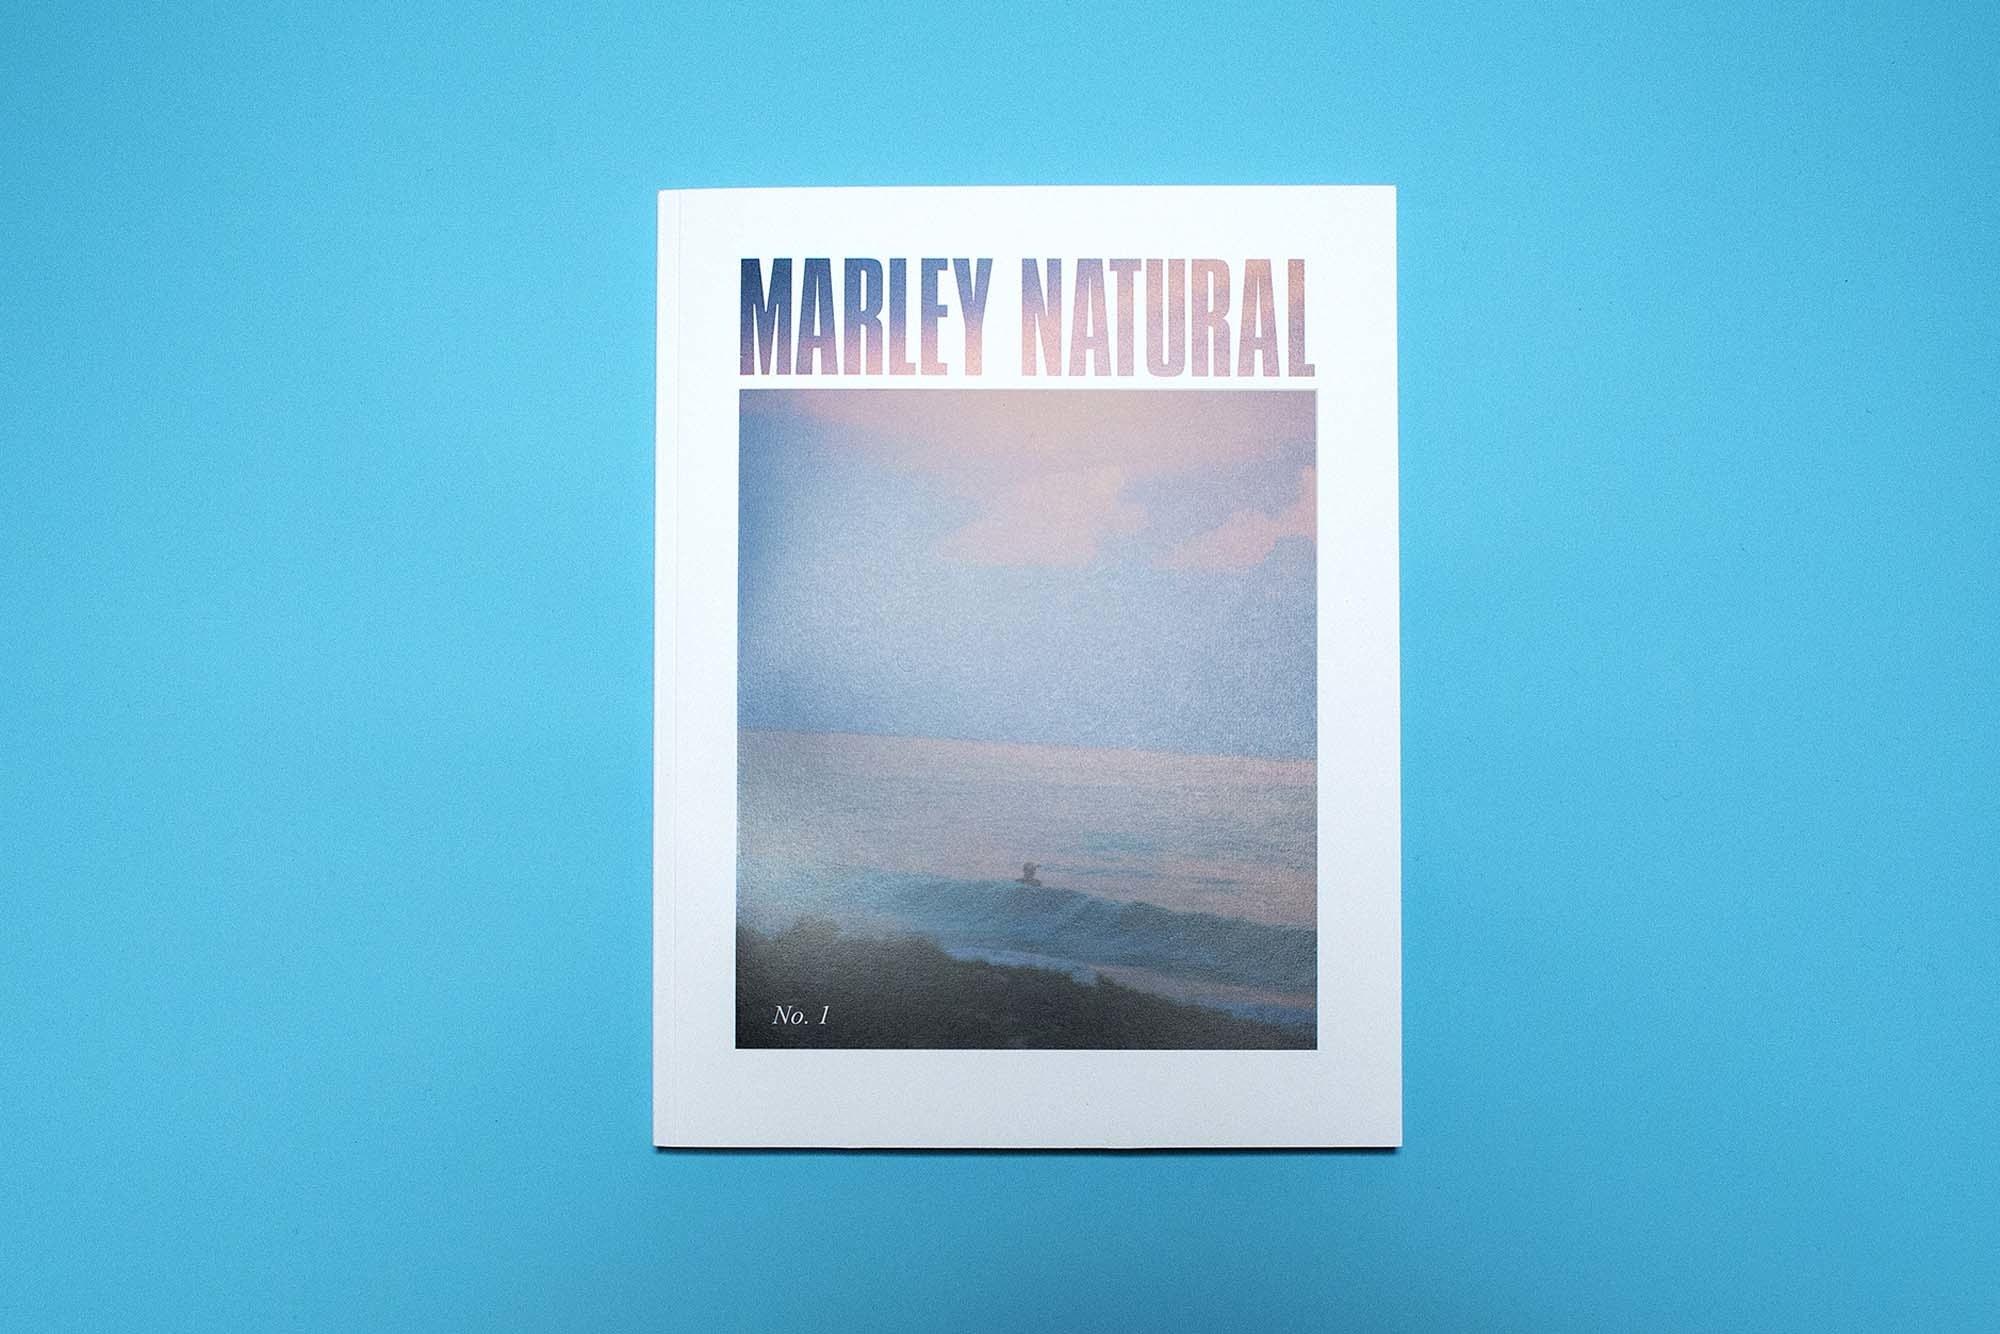 "<a href=""https://www.marleynaturalshop.com/products/magazine-2016"" target=""_blank"">MARLEY NATURAL</a>"